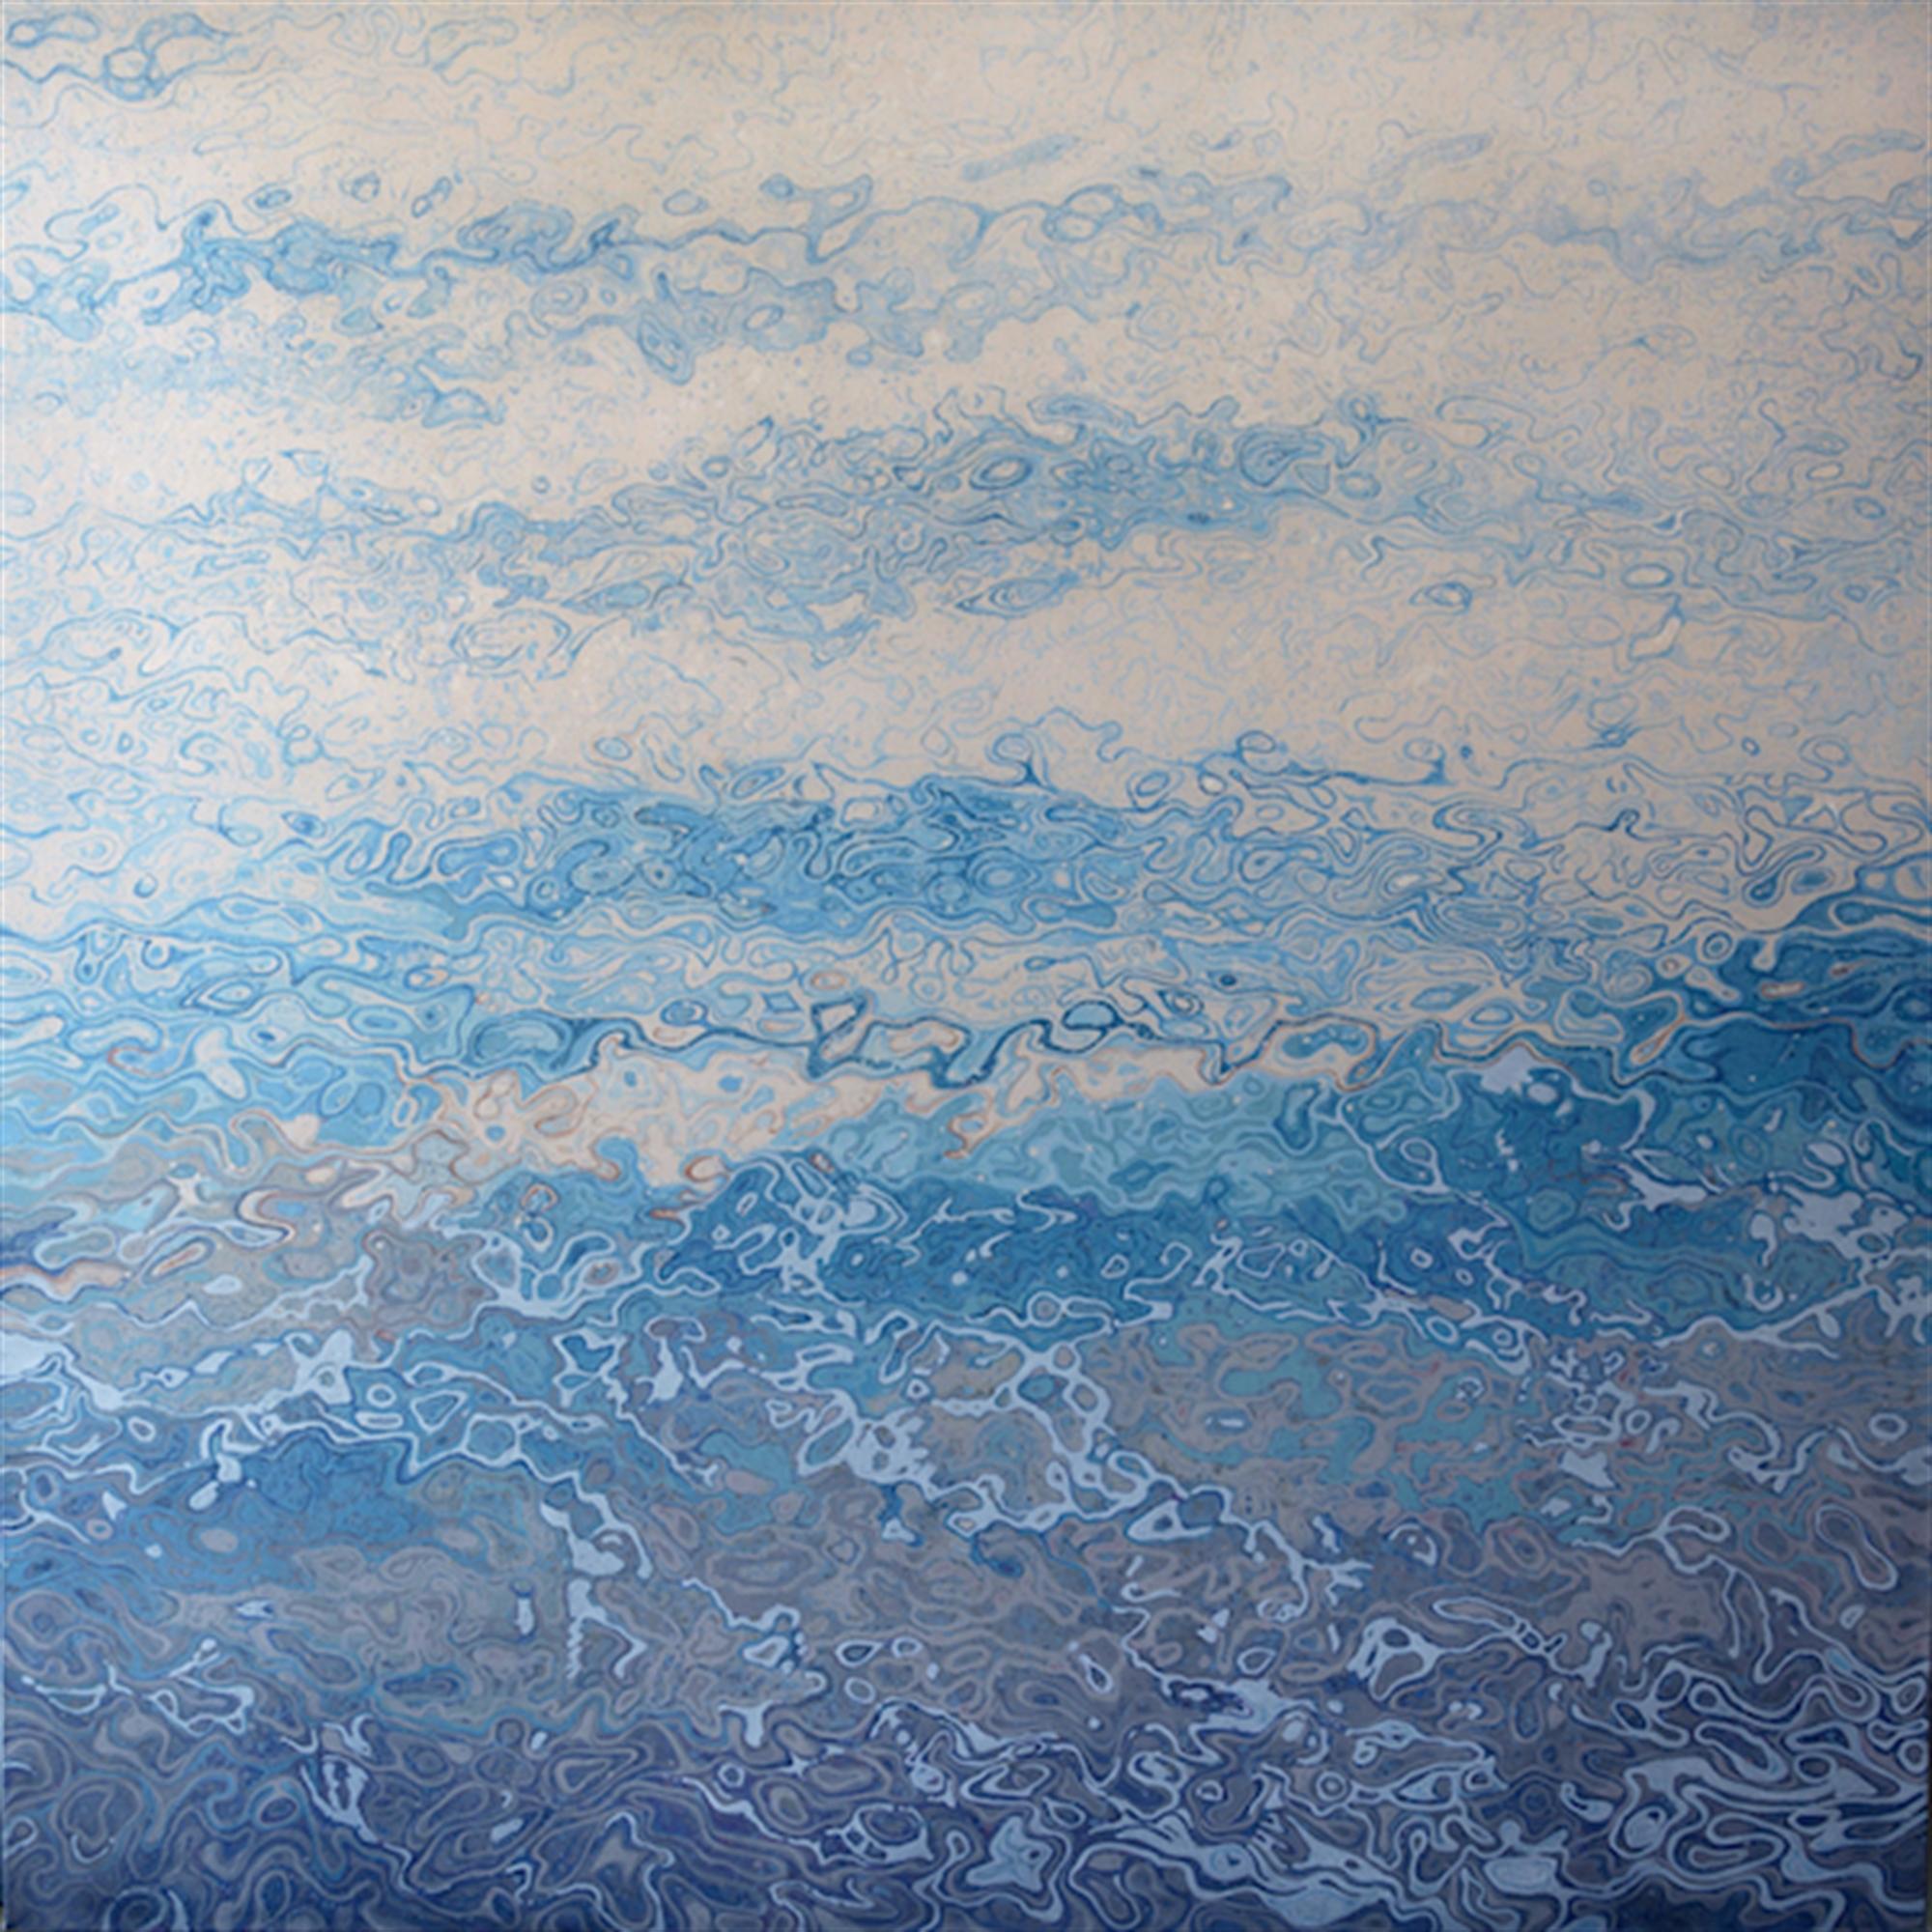 Cadence by Tatyana Klevenskiy